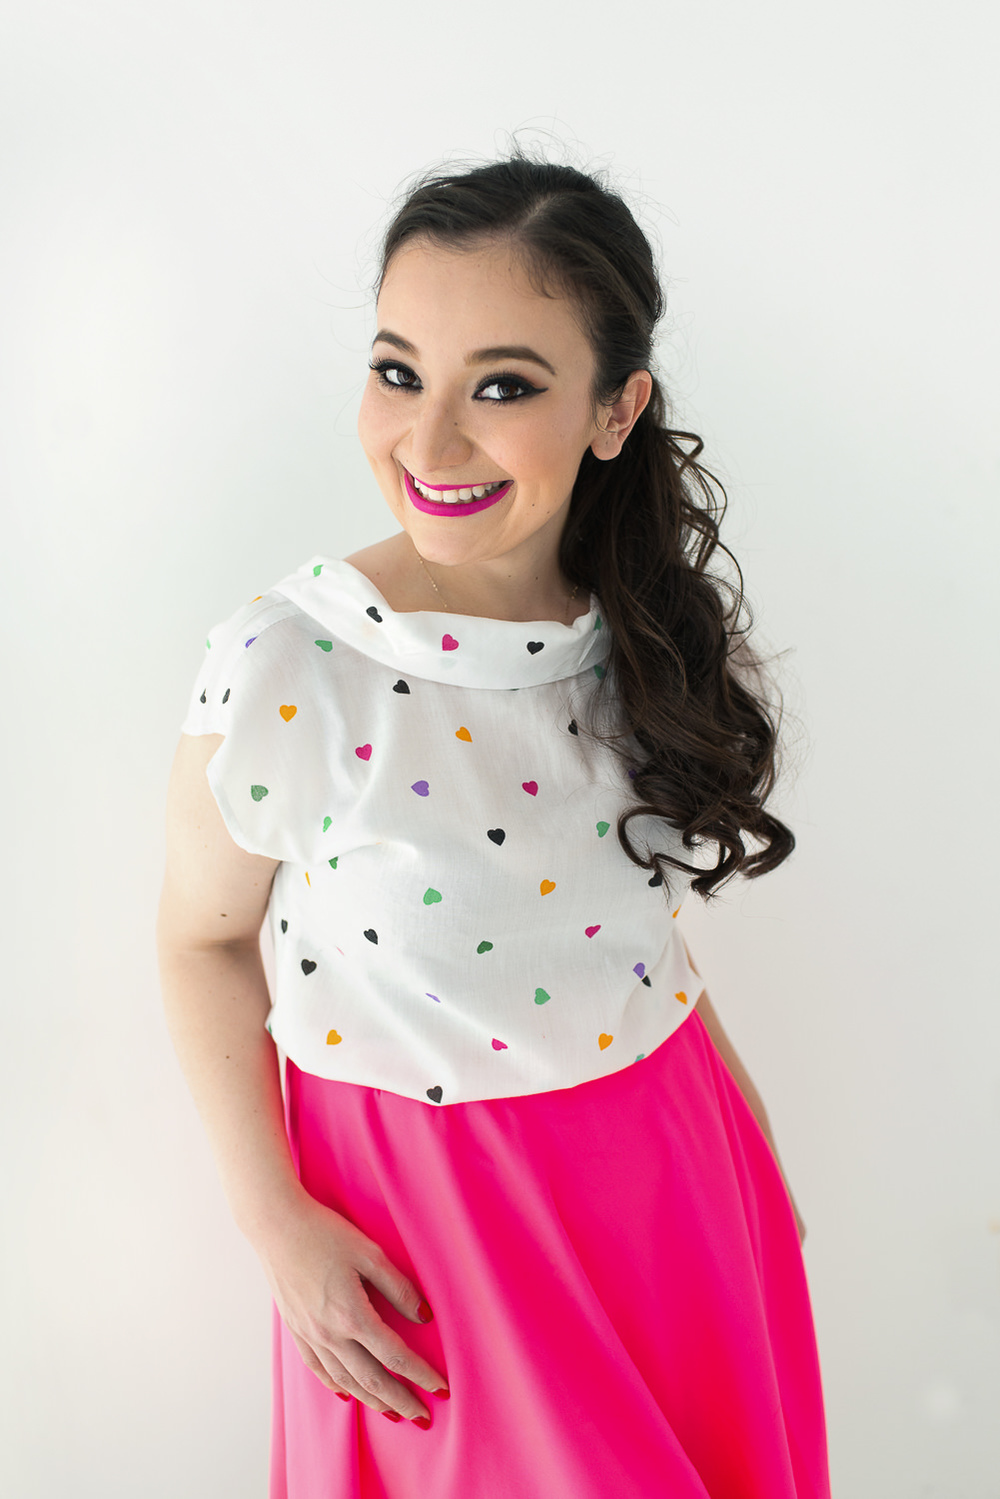 Sesion-fotos-mexicali-retrato-Glenda-Campos-pink-skirt